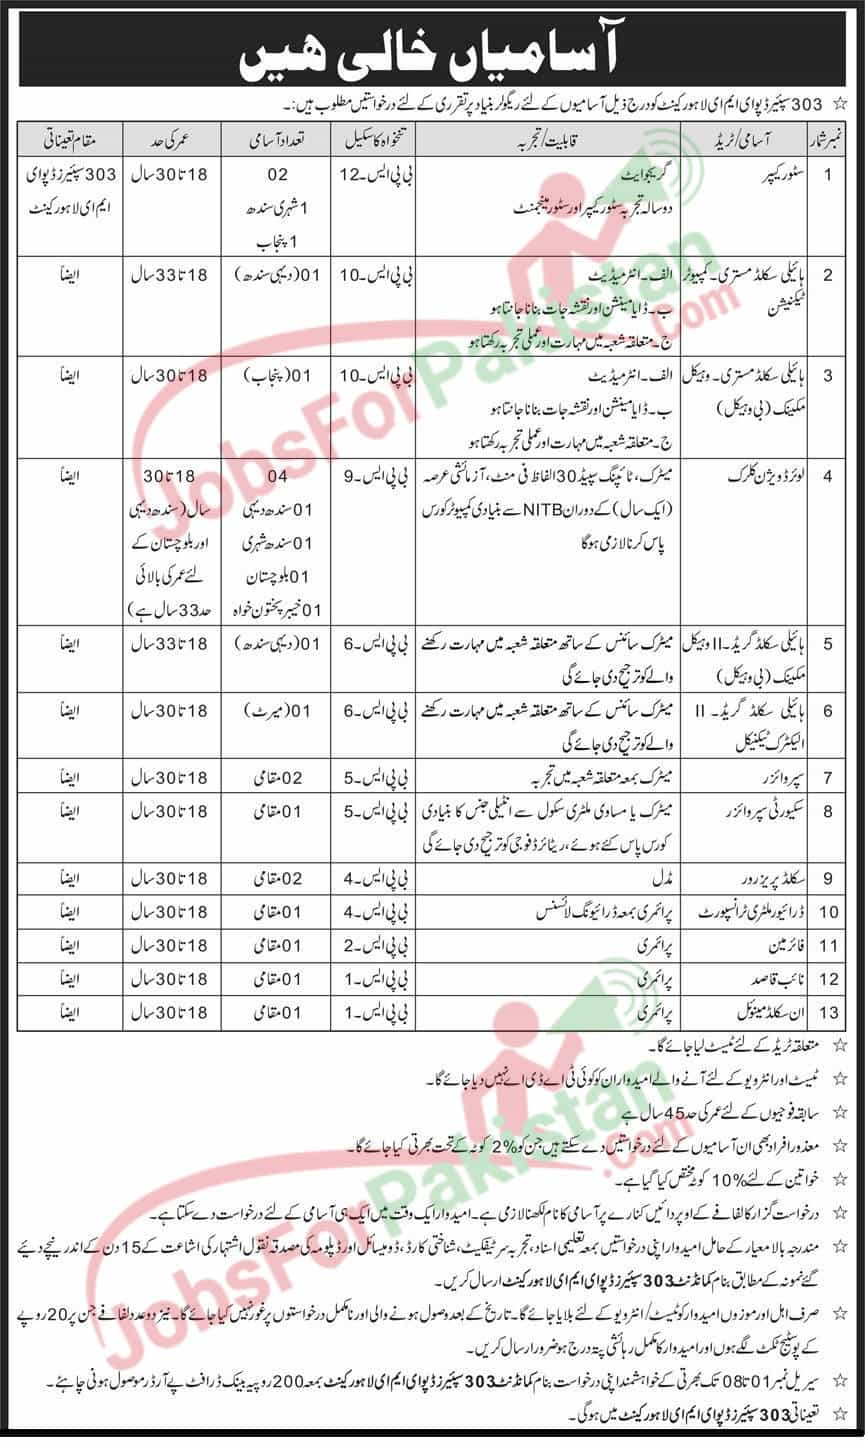 Pak Army EME Jobs October 2020 Original Advertisement